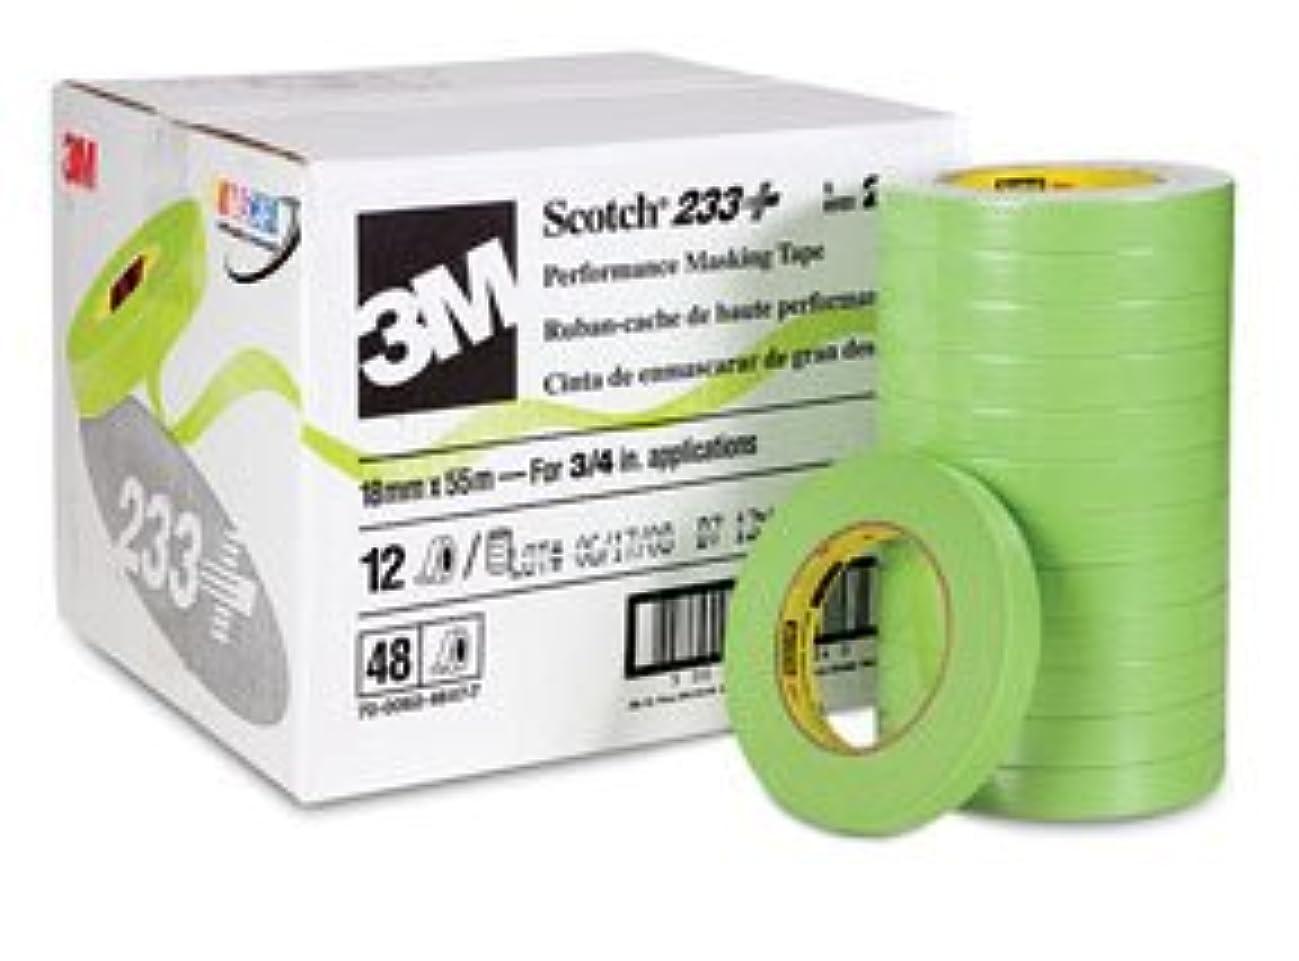 3M 26334 Crl 3M 3/4 Inch Automotive Performance Paint Masking Tape, Green